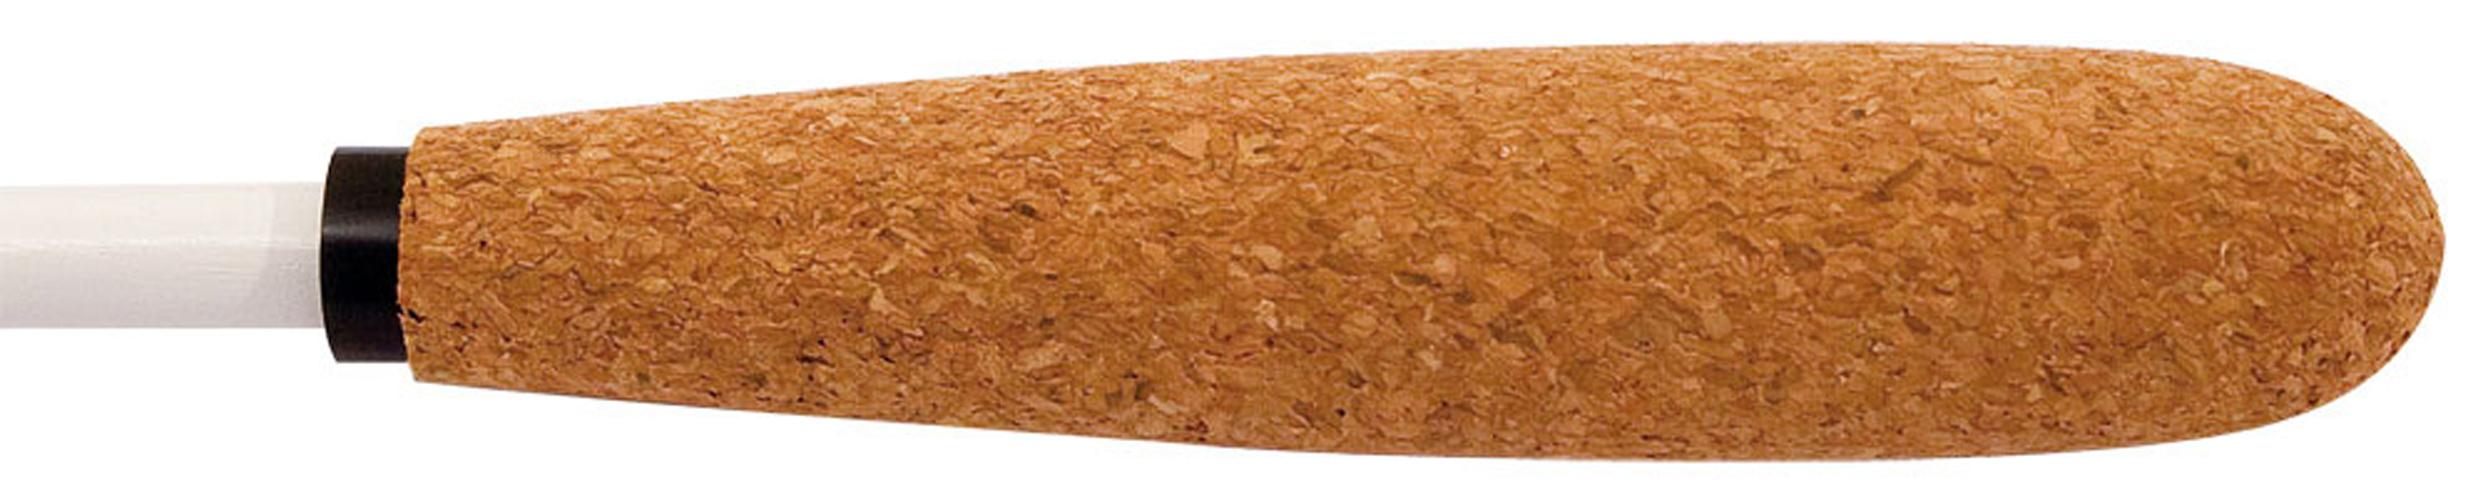 Baton Tapered Handle Cork - 12 Inch